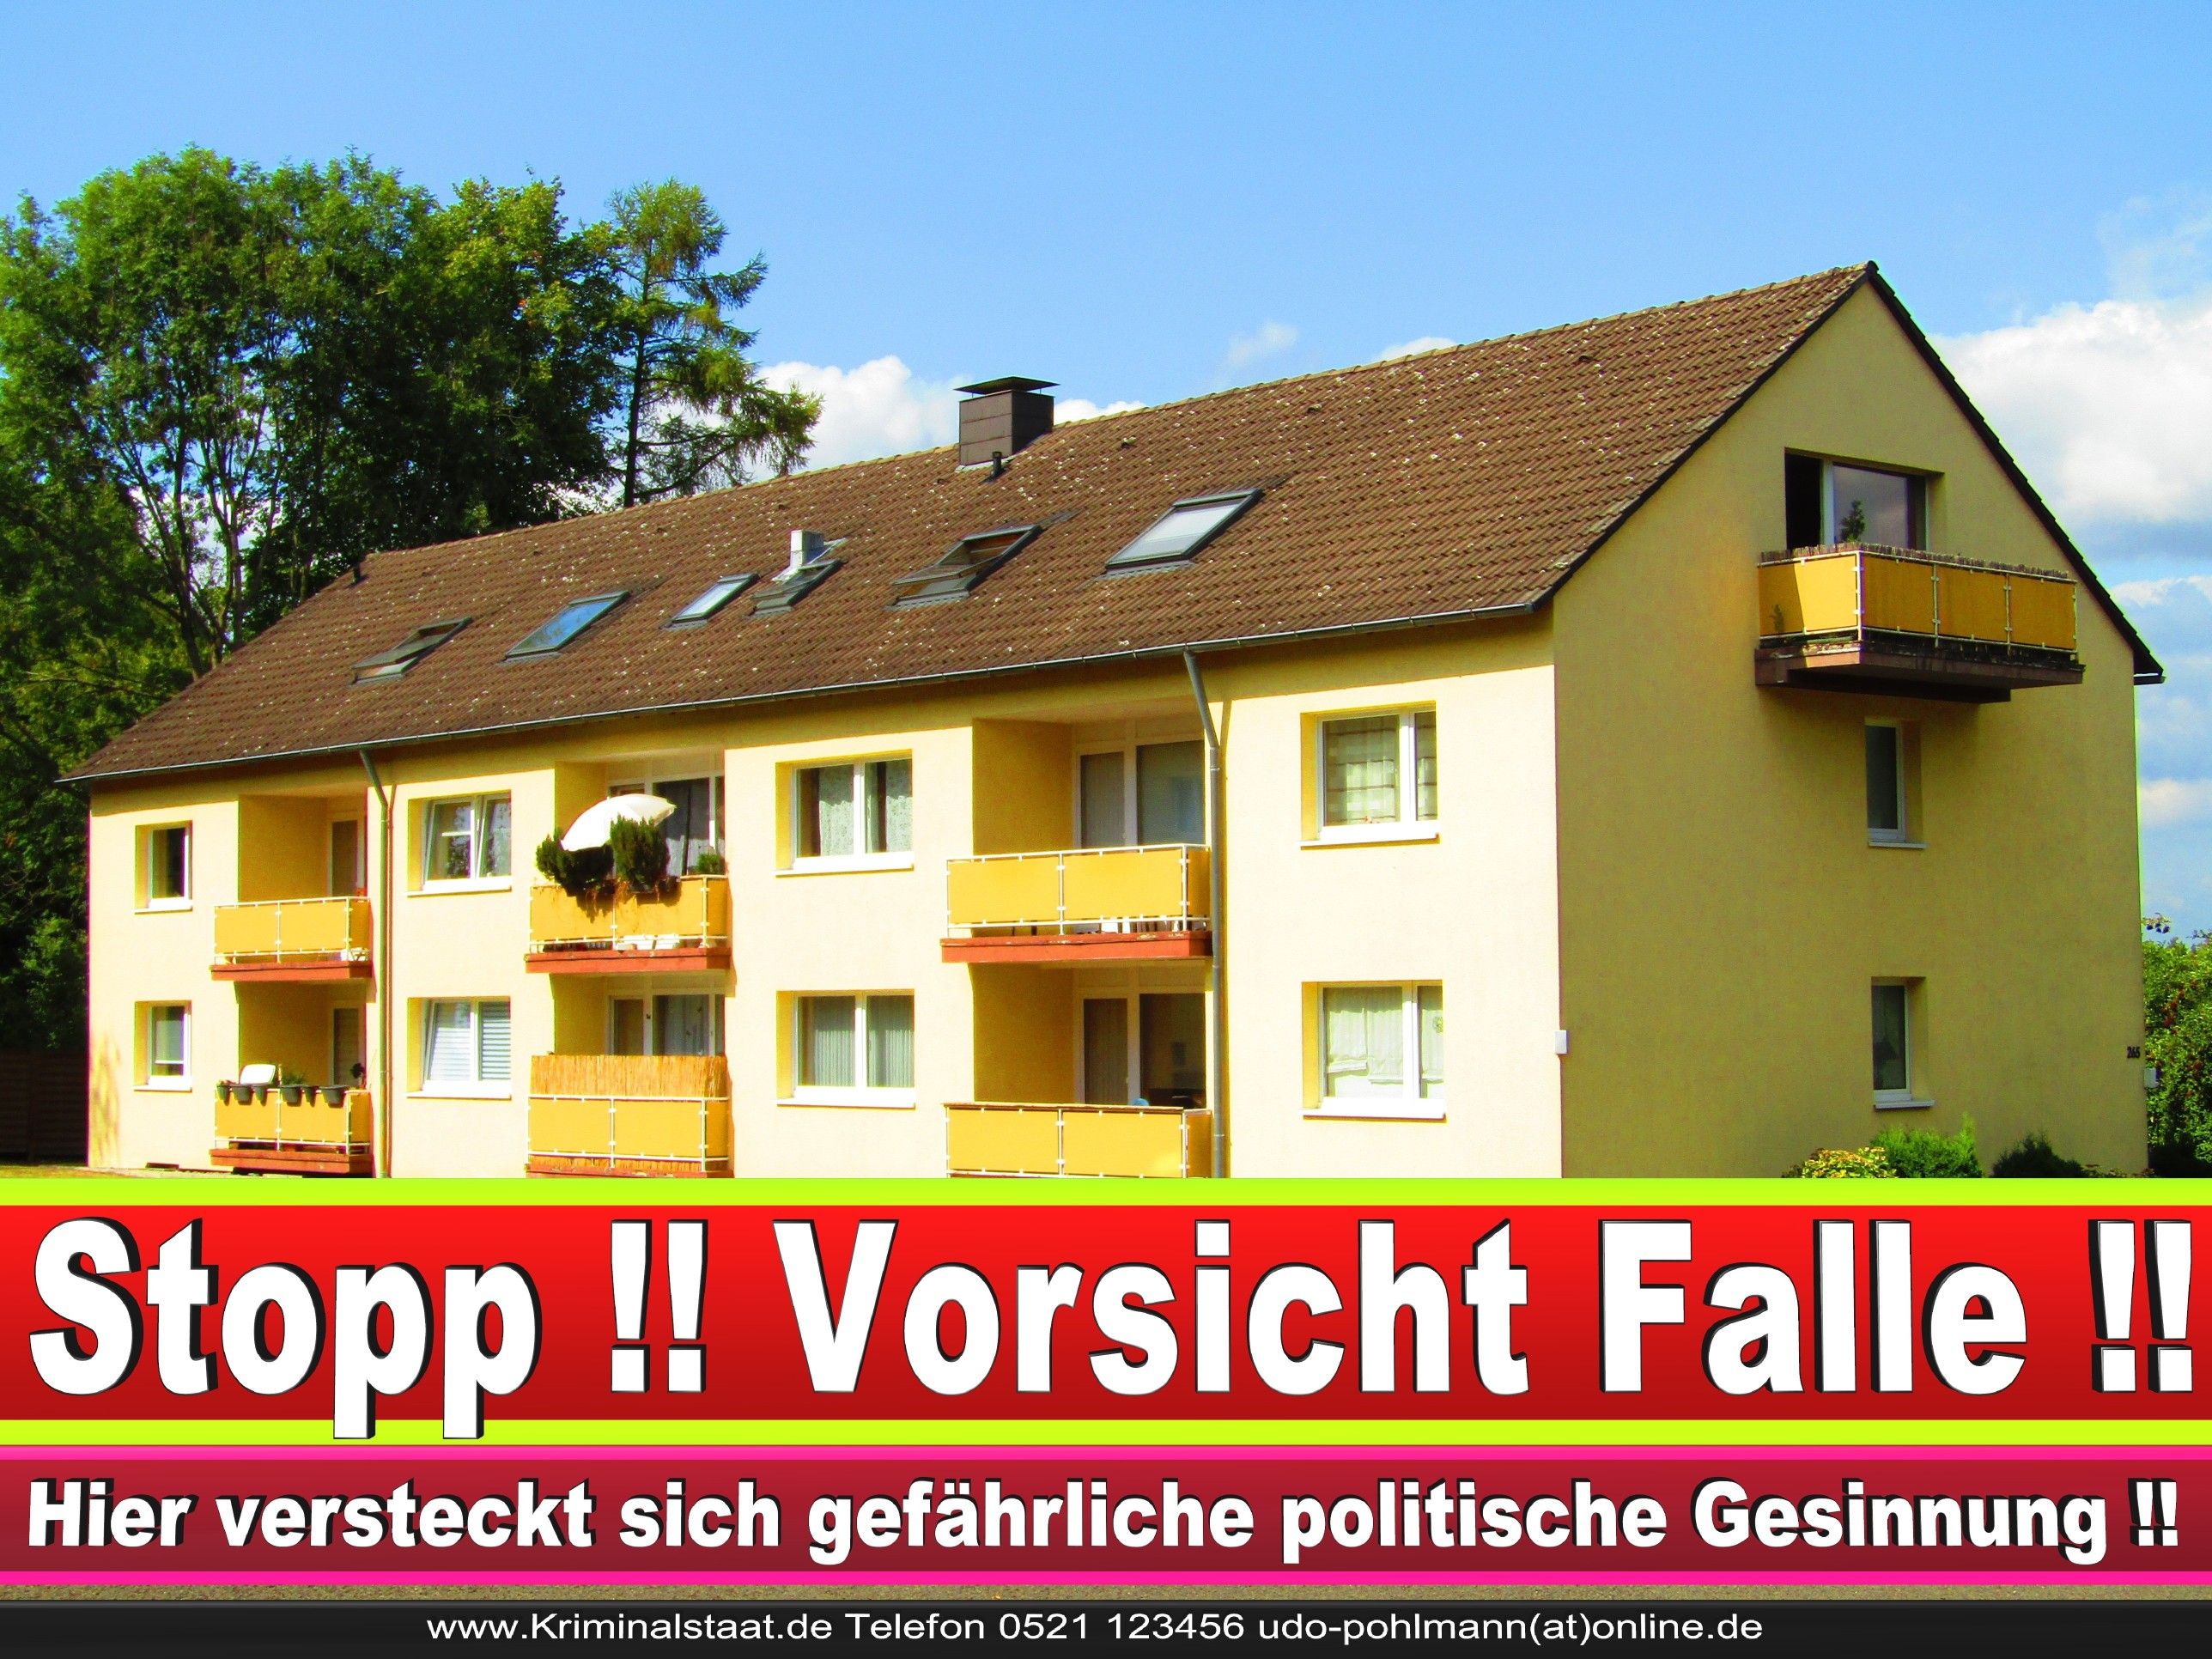 WILLI BLUMENSAAT CDU BIELEFELD 3 LANDTAGSWAHL BUNDESTAGSWAHL BÜRGERMEISTERWAHL